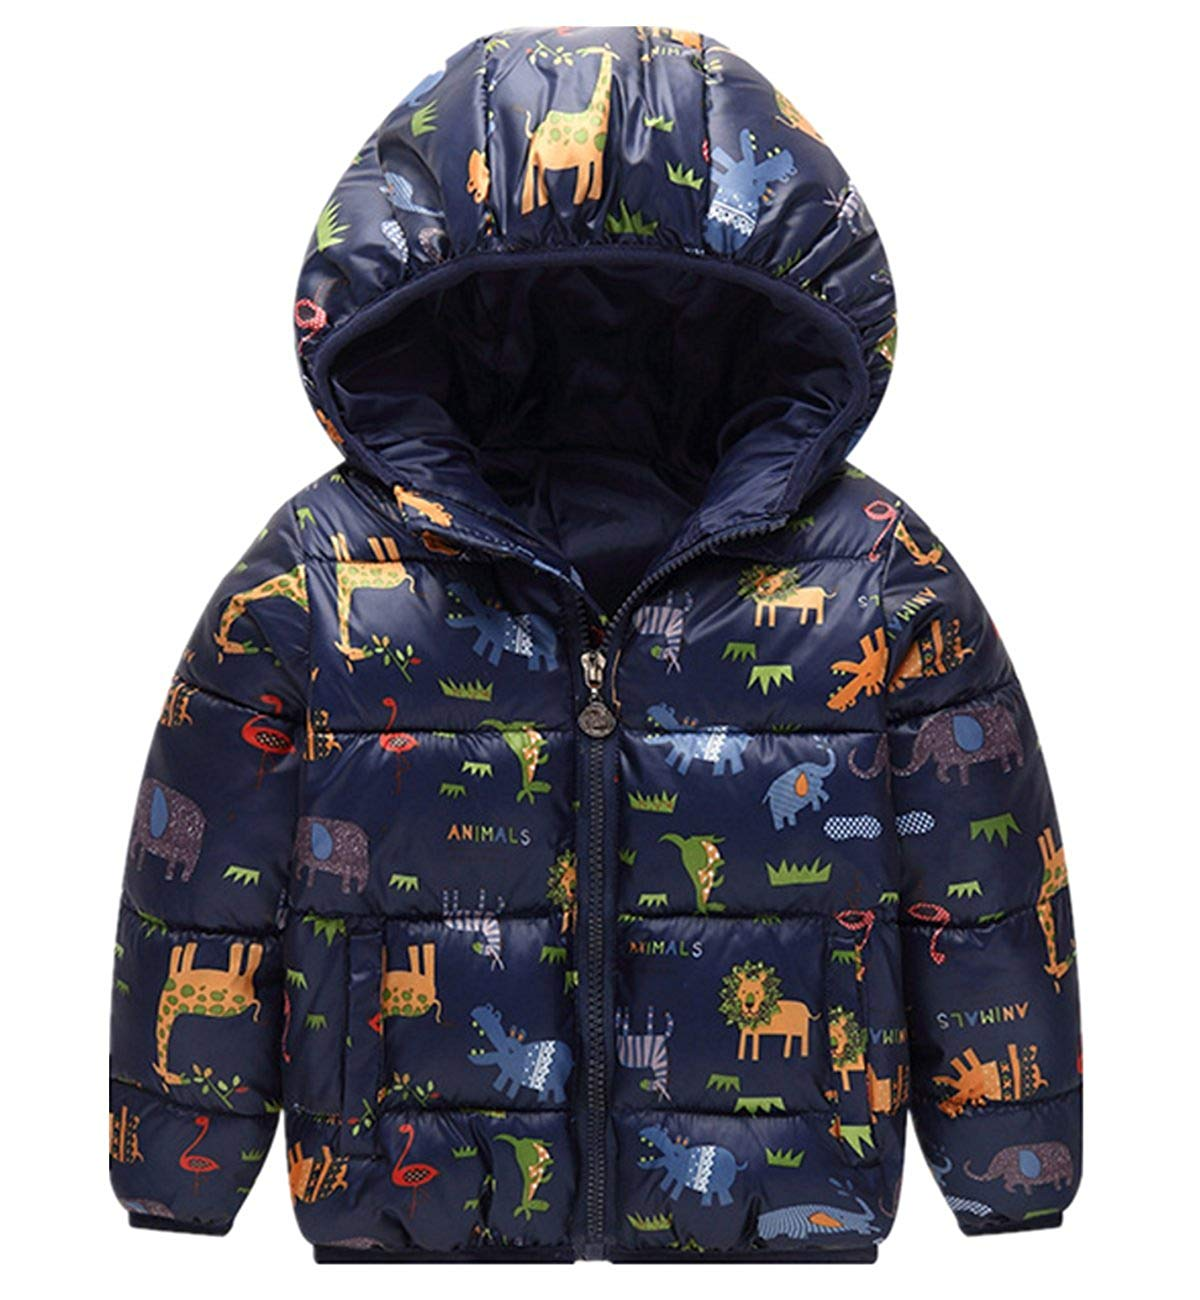 c0c93db30a87 Get Quotations · Kids Boys Girls Cartoon Giraffe Printed Hoodie Down Coat  Lightweight Warm Hooded Down Snowsuit